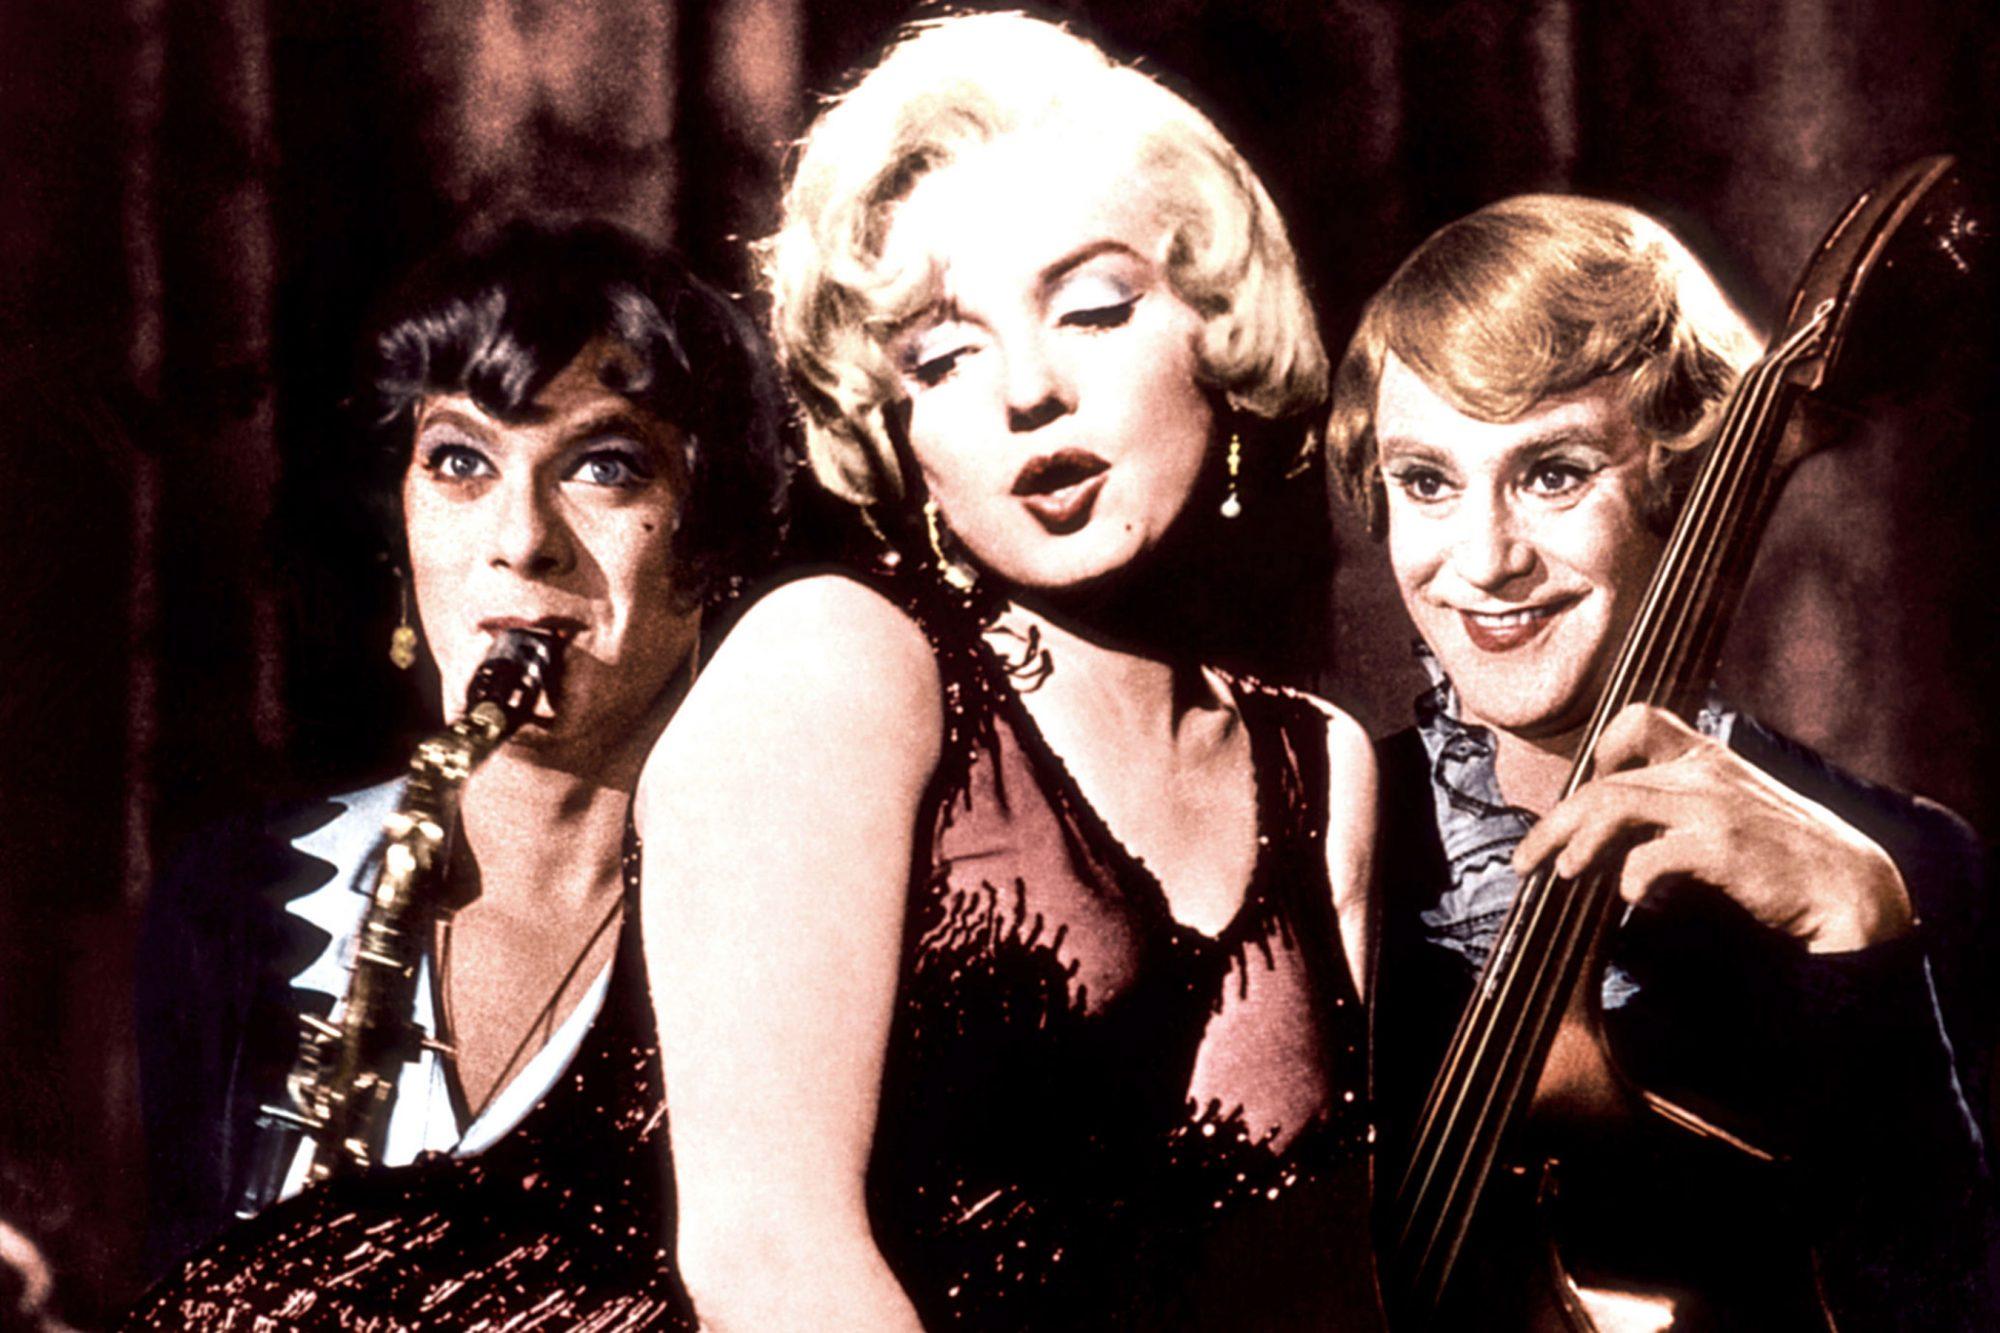 SOME LIKE IT HOT, Tony Curtis, Marilyn Monroe, Jack Lemmon, 1959